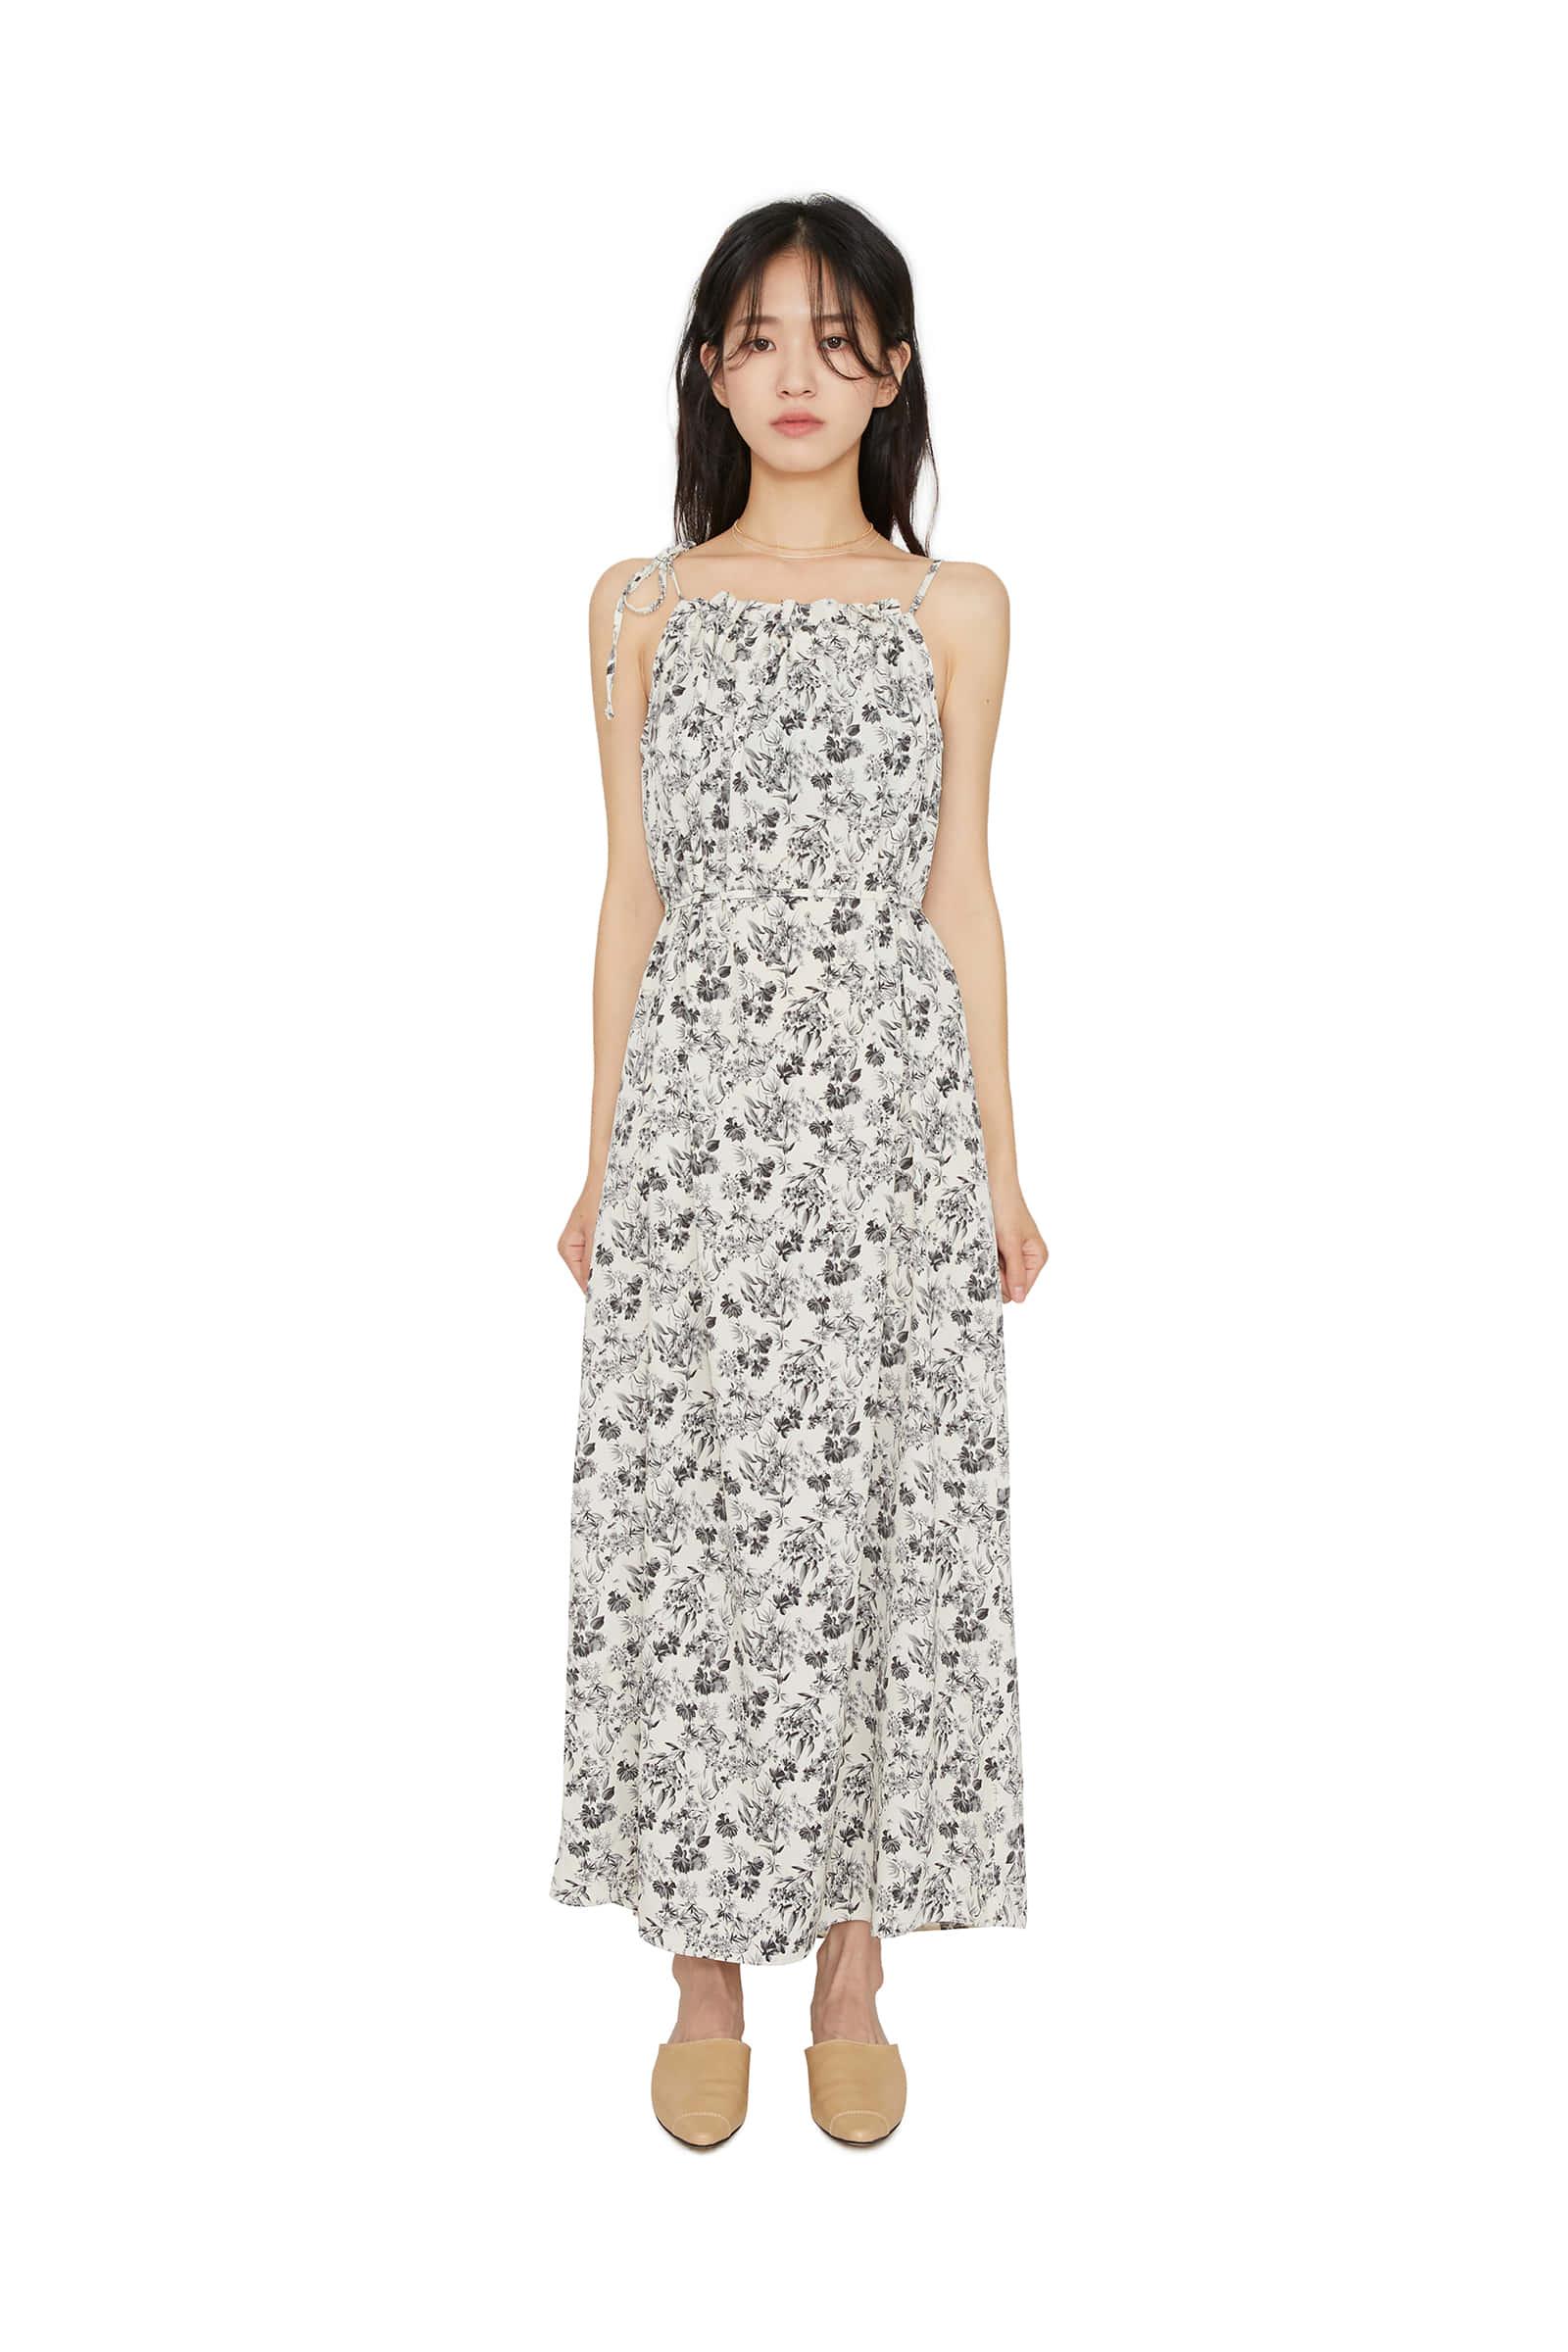 Sketch flower maxi dress